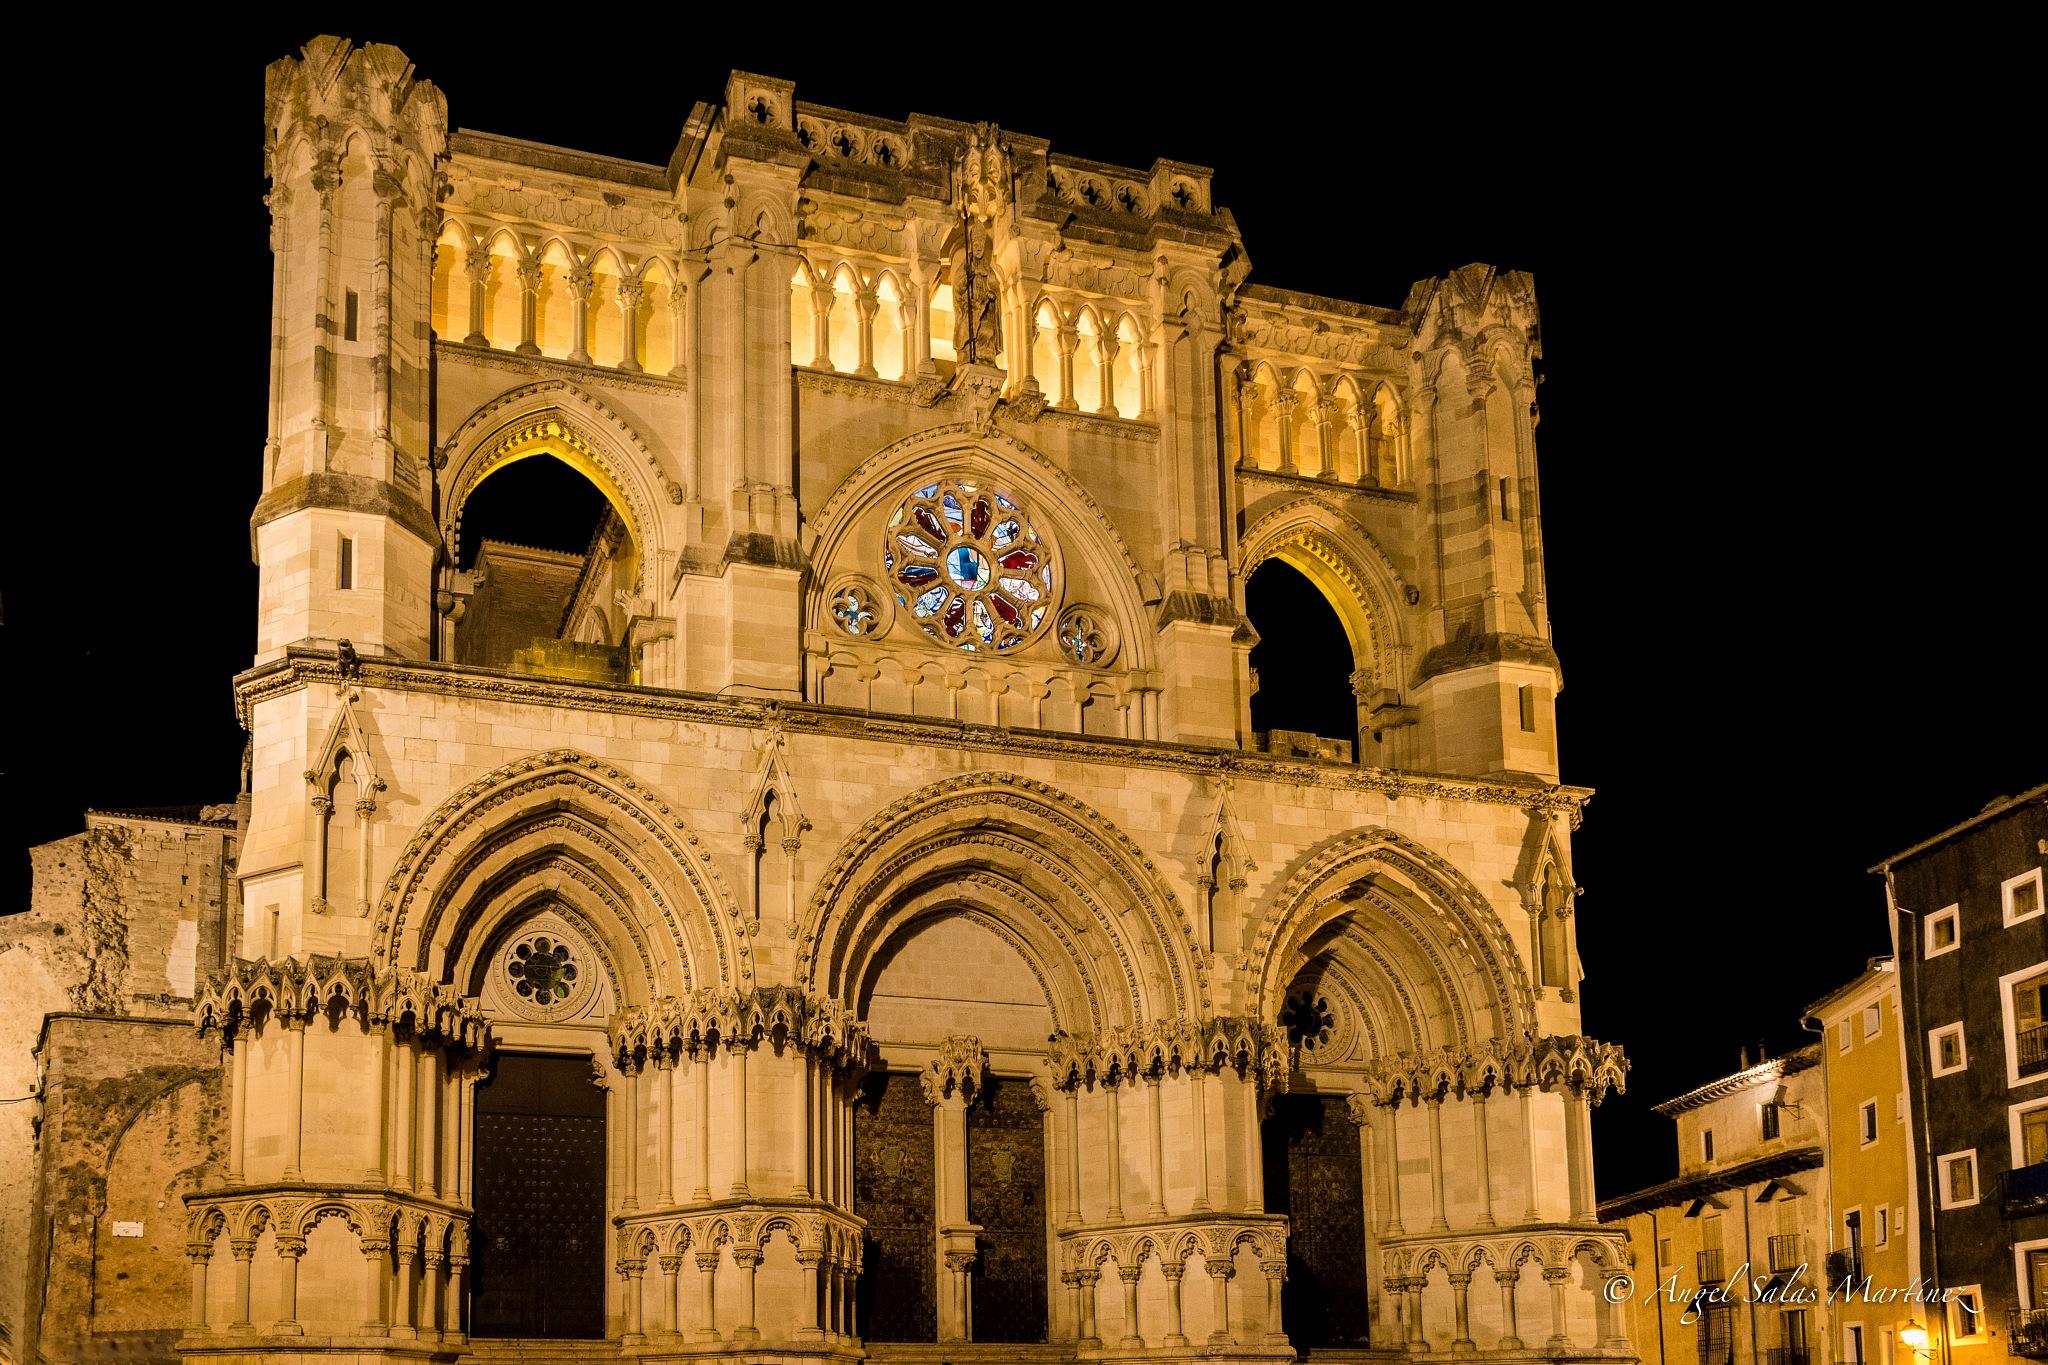 Catedral by Ángel Salas Martínez